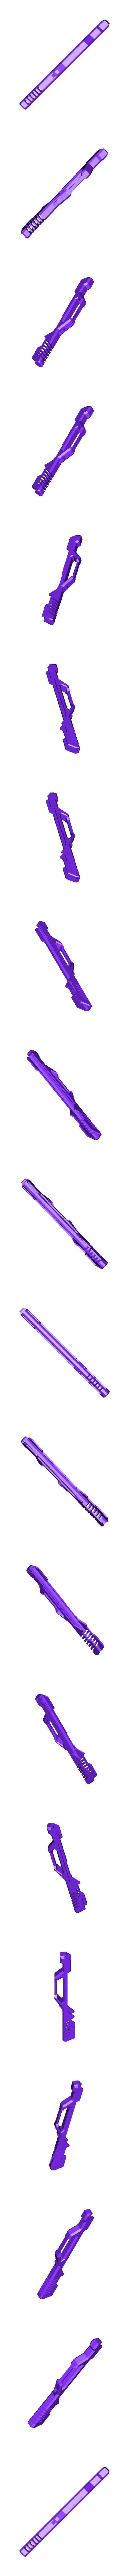 Heavy Gun_02_OliveGreen.stl Download STL file Heavy Gun Walker • 3D print design, Jwoong